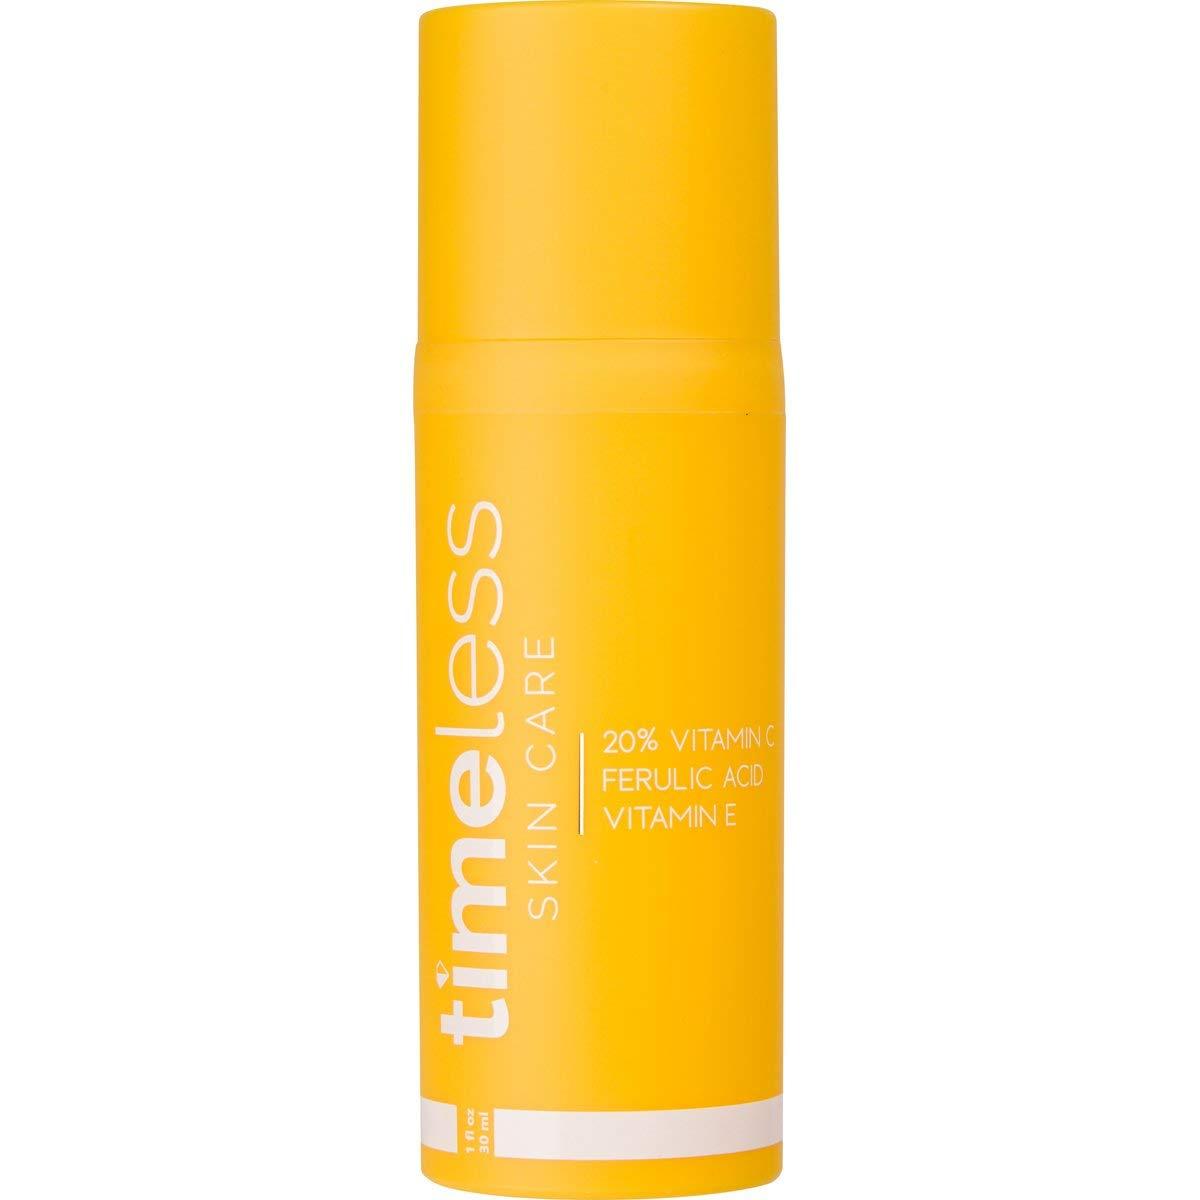 Timeless skincare vitamin c serum